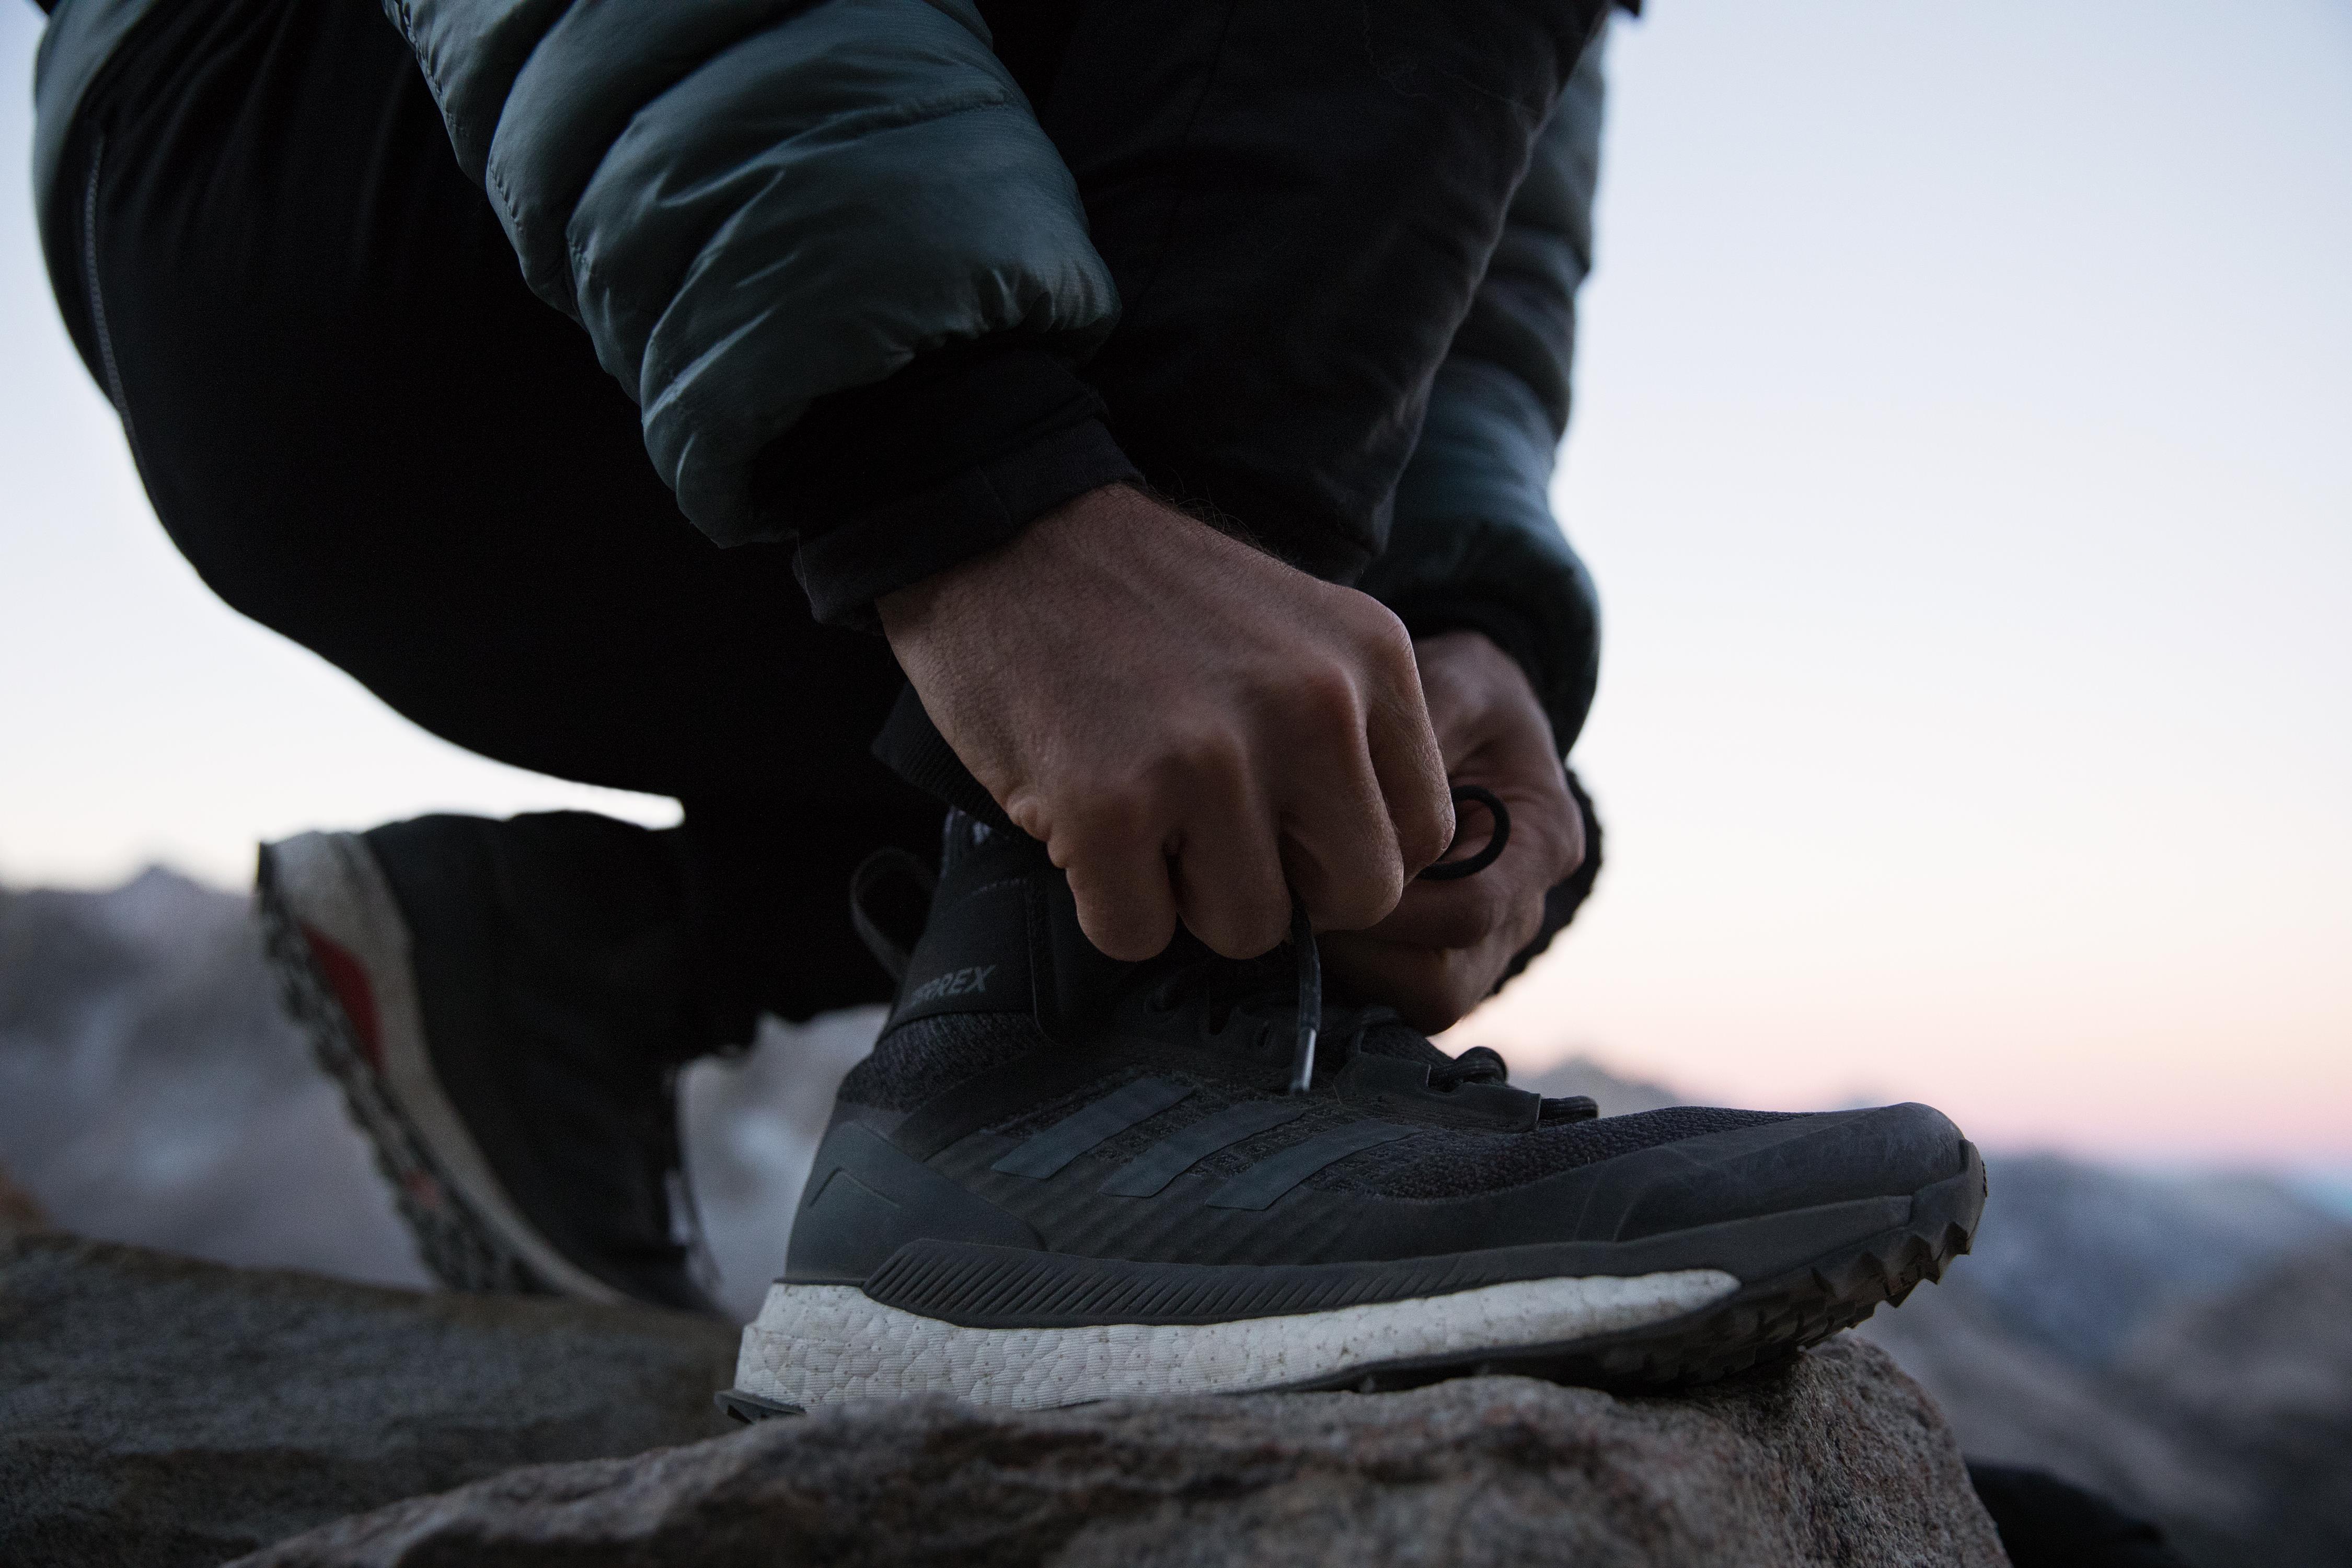 Adidas Terrex Free Hiker - Discerning Gent